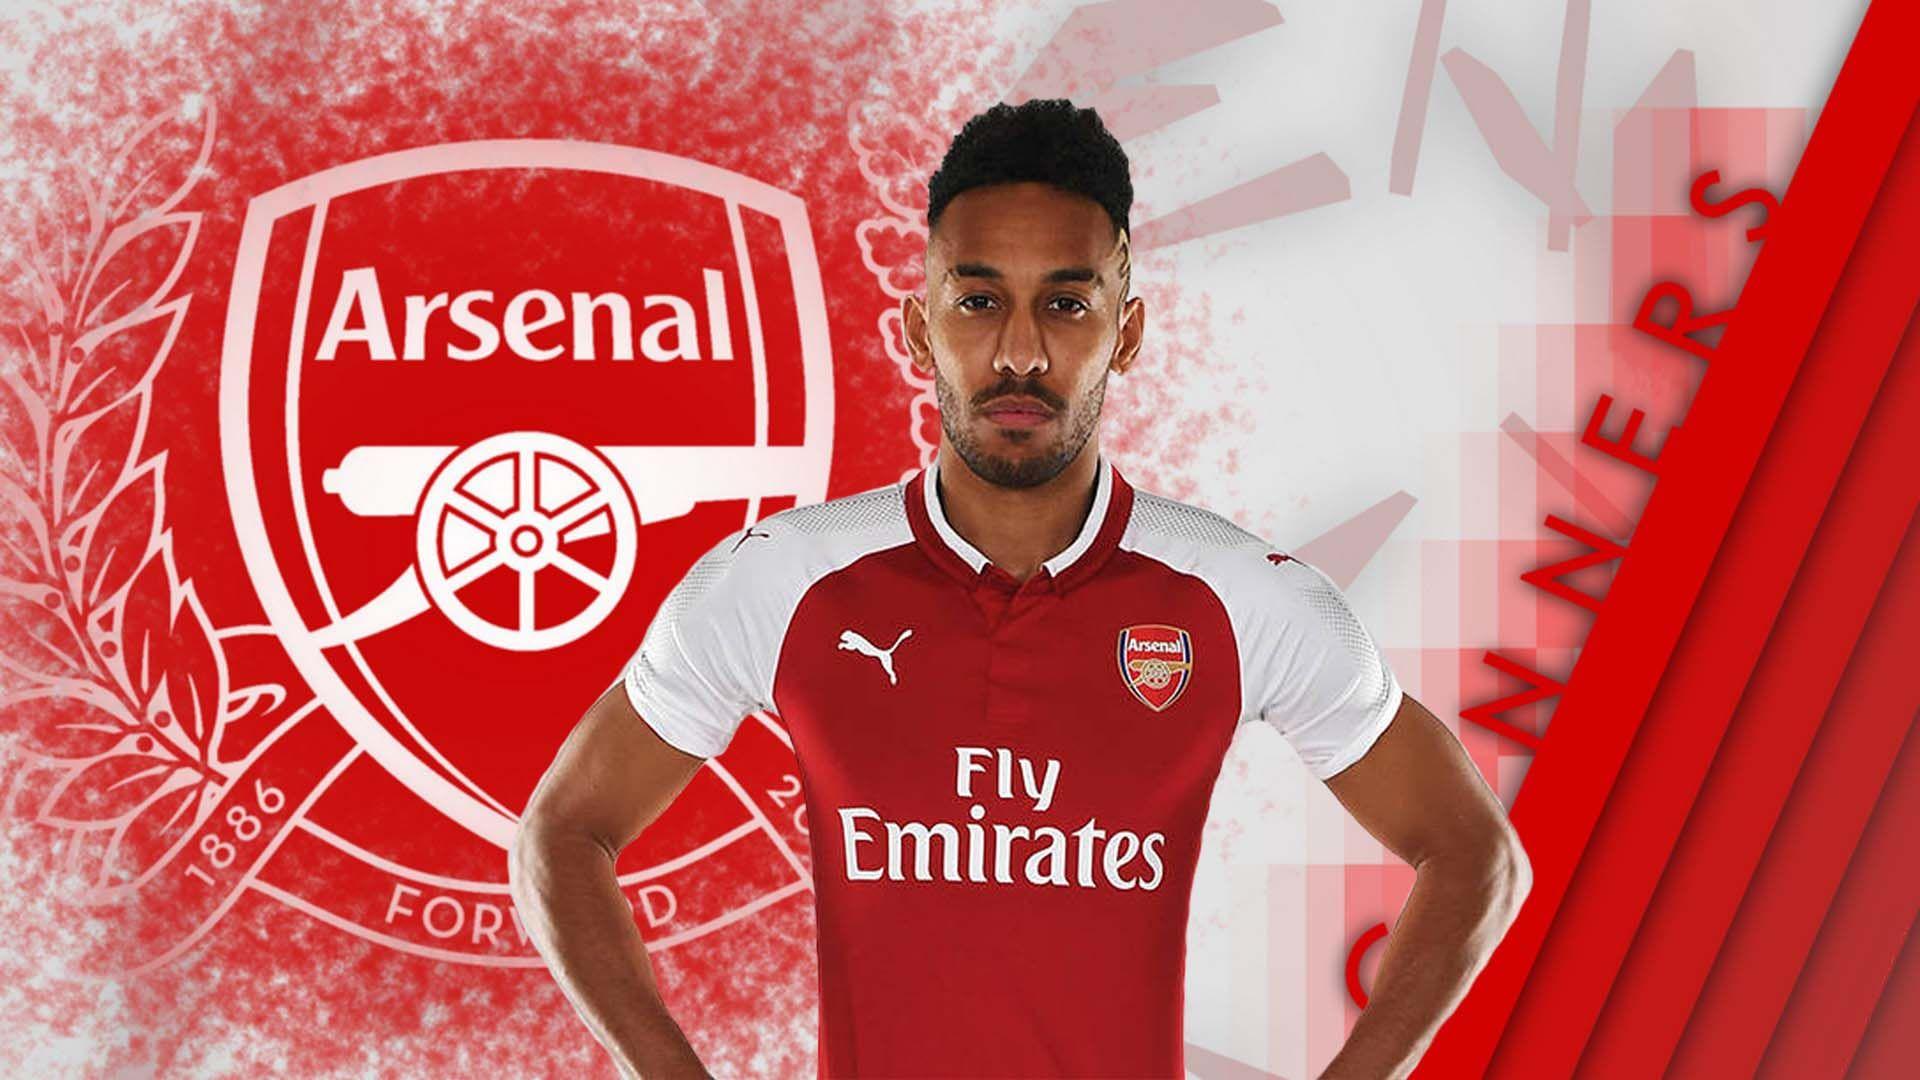 Pierre Emerick Aubameyang Arsenal Wallpaper Hd 2020 Live Wallpaper Hd Arsenal Wallpapers Aubameyang Arsenal Arsenal